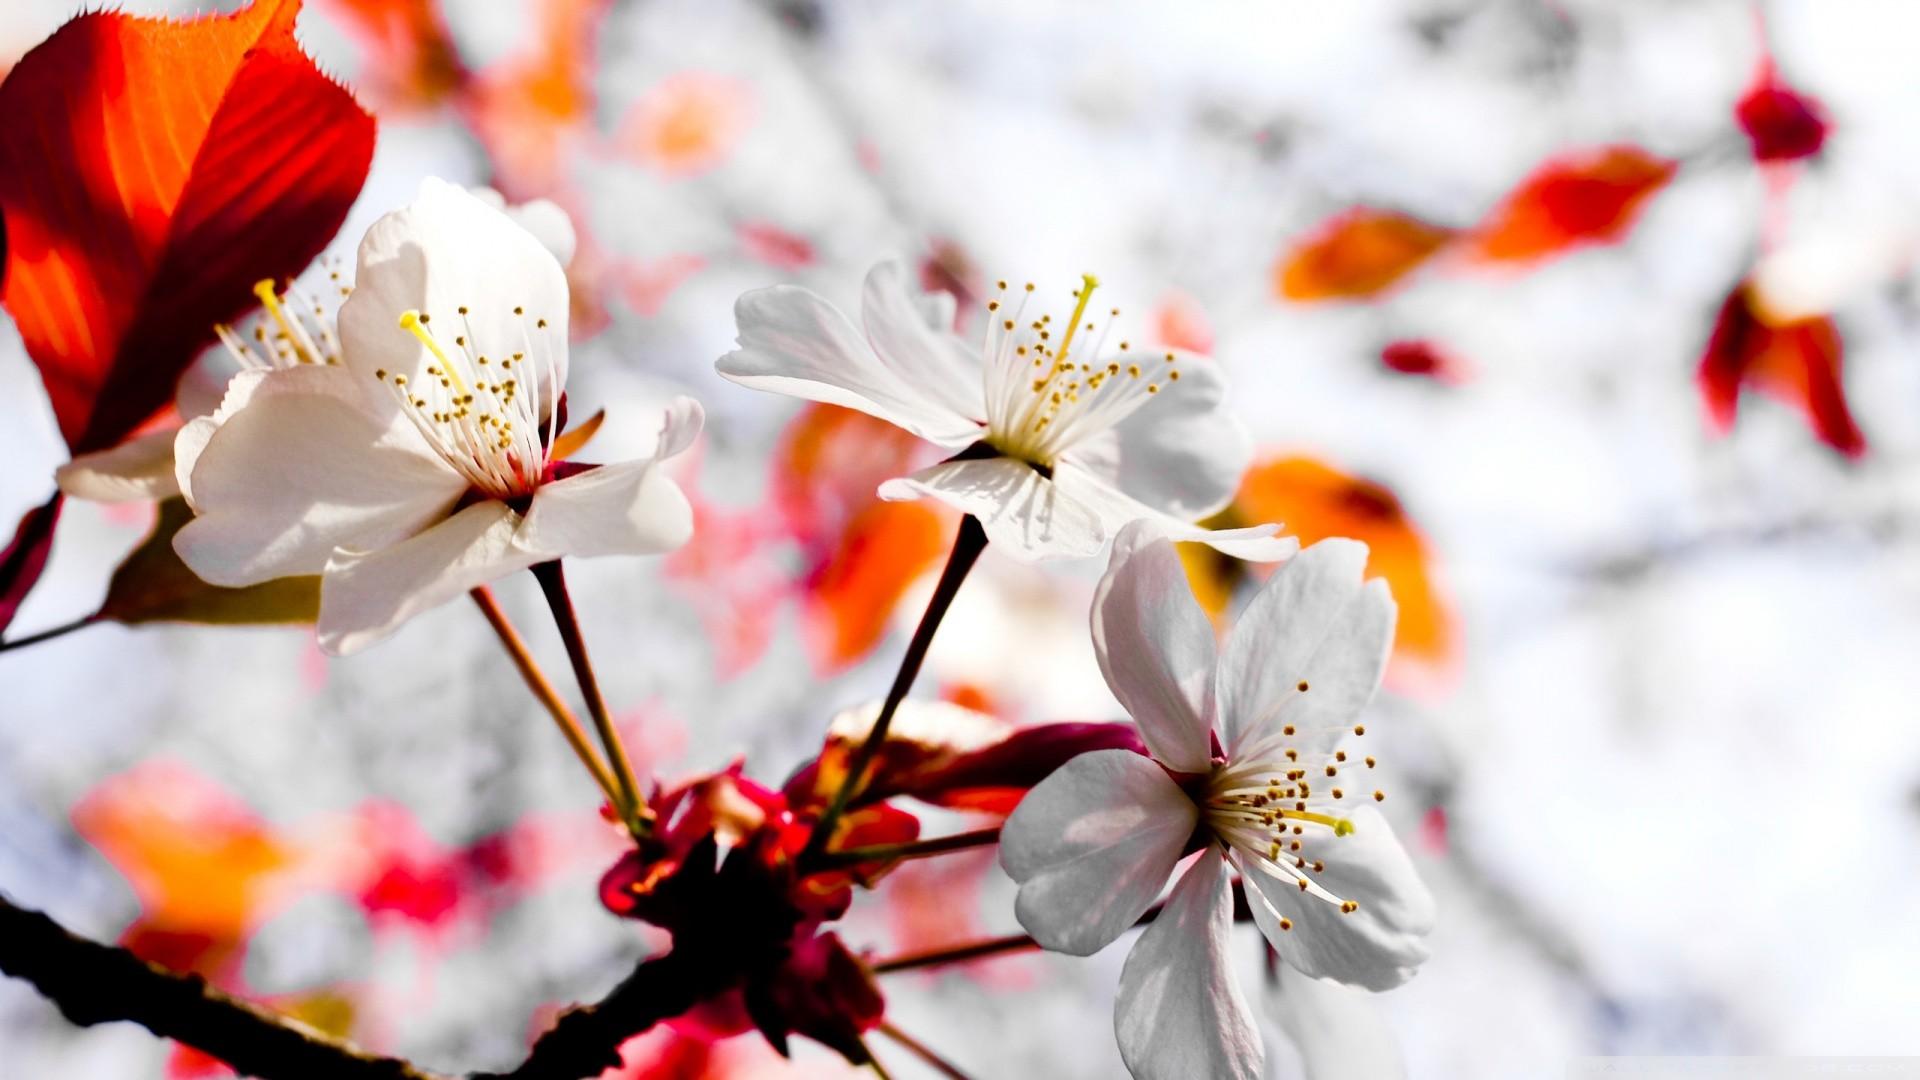 Spring Season Wallpapers ·① WallpaperTag